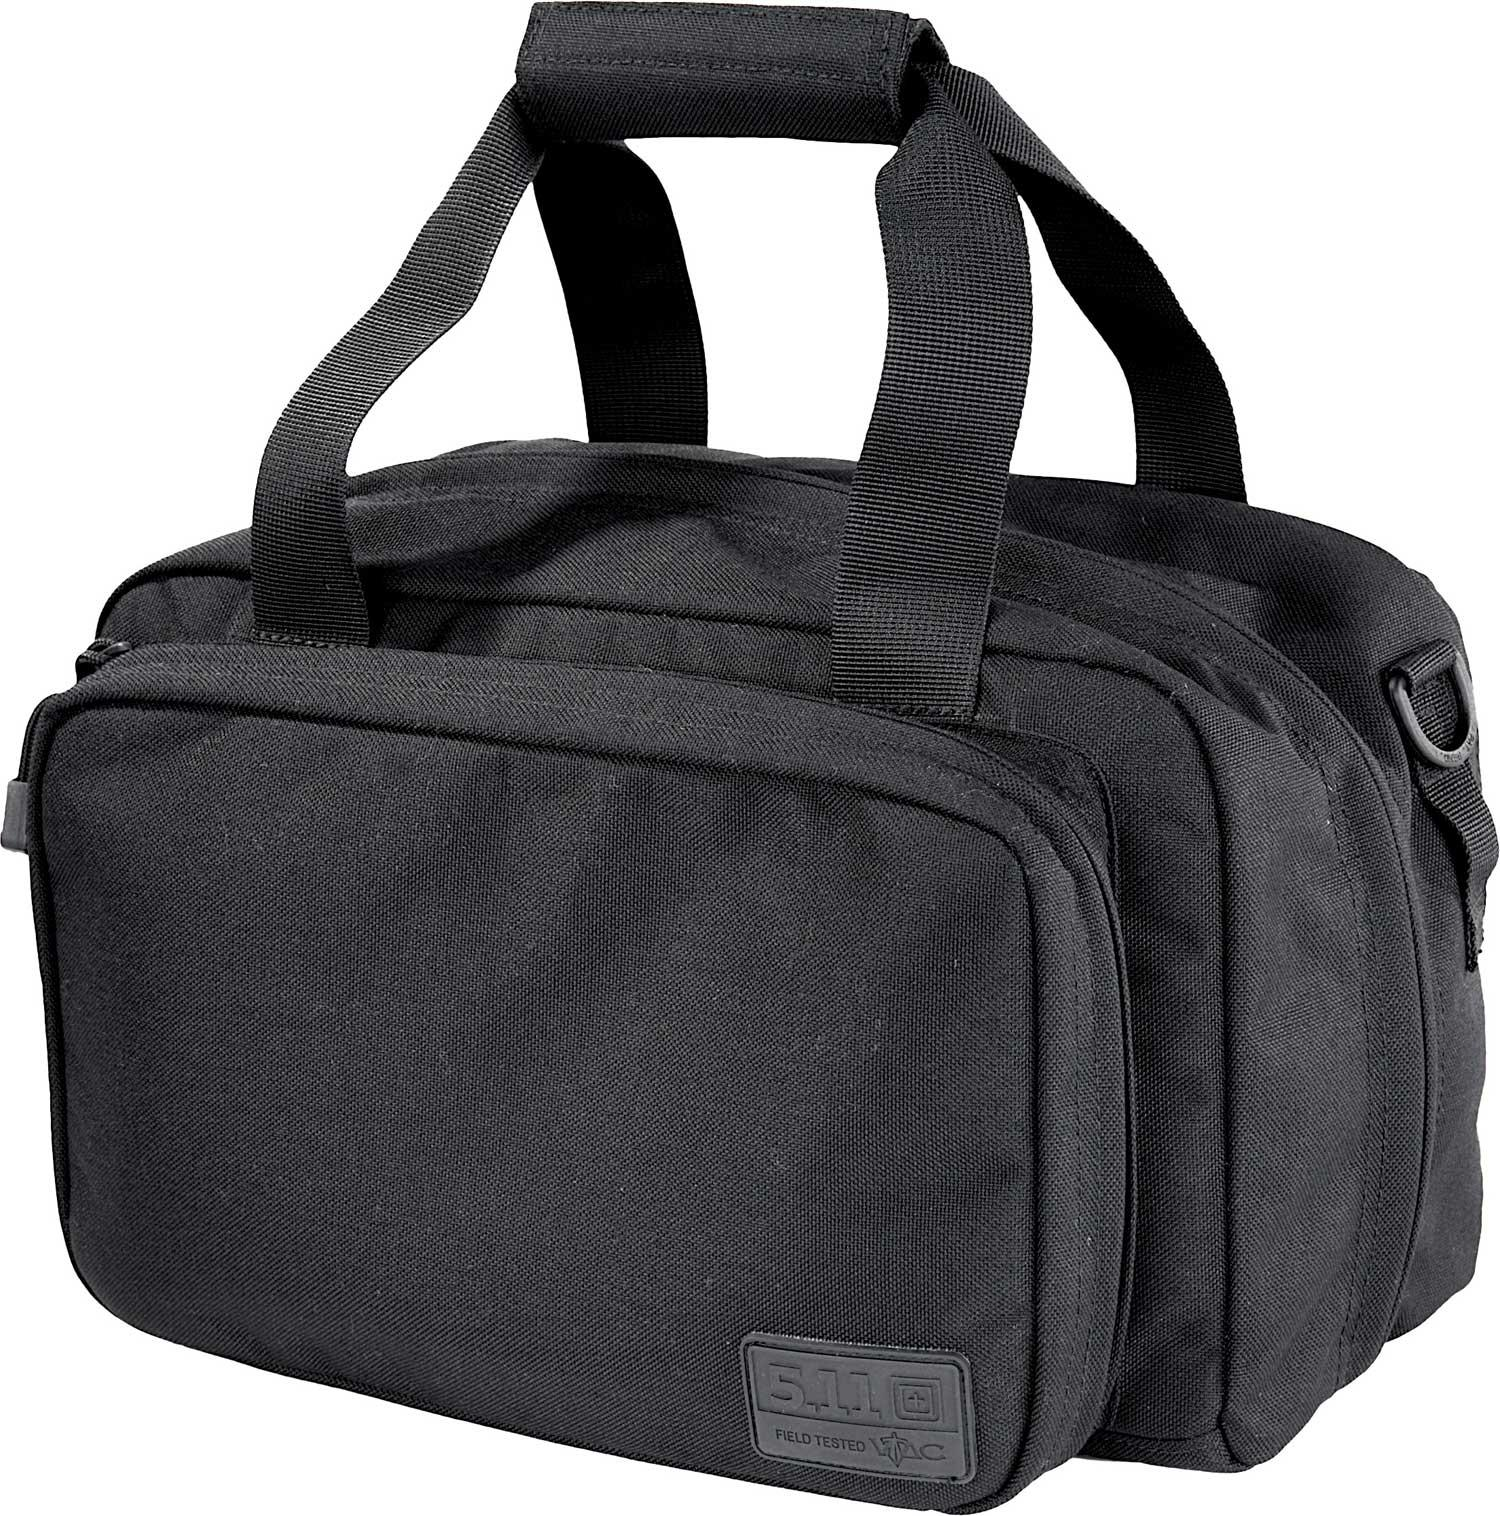 5.11 Tactical Large Kit Bag Black